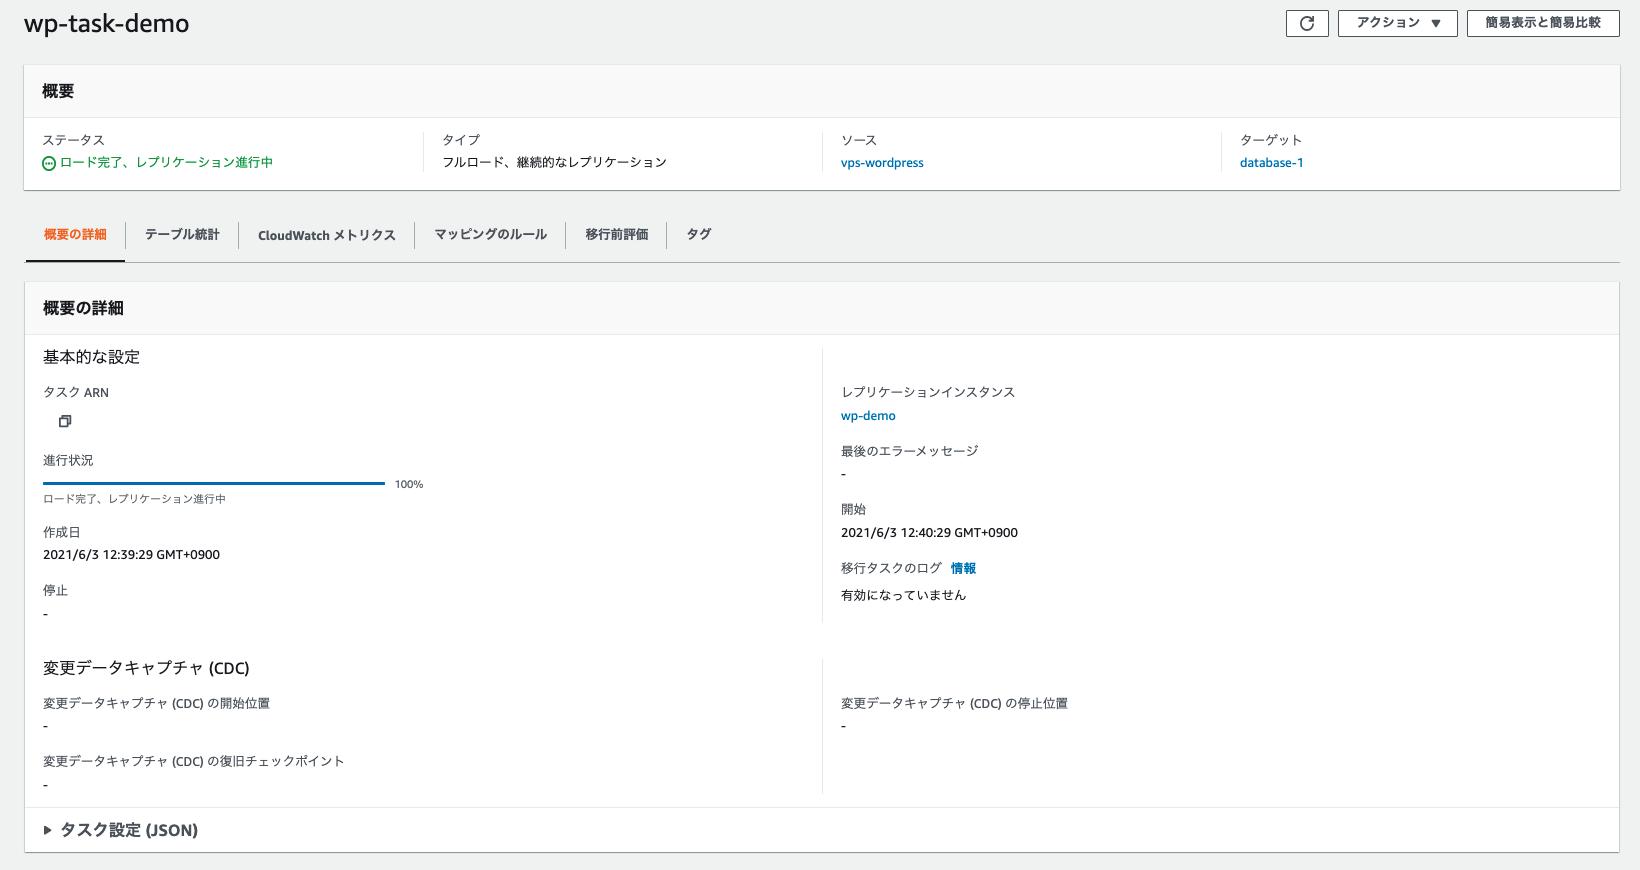 https://cdn-ssl-devio-img.classmethod.jp/wp-content/uploads/2021/06/Untitled-2.png